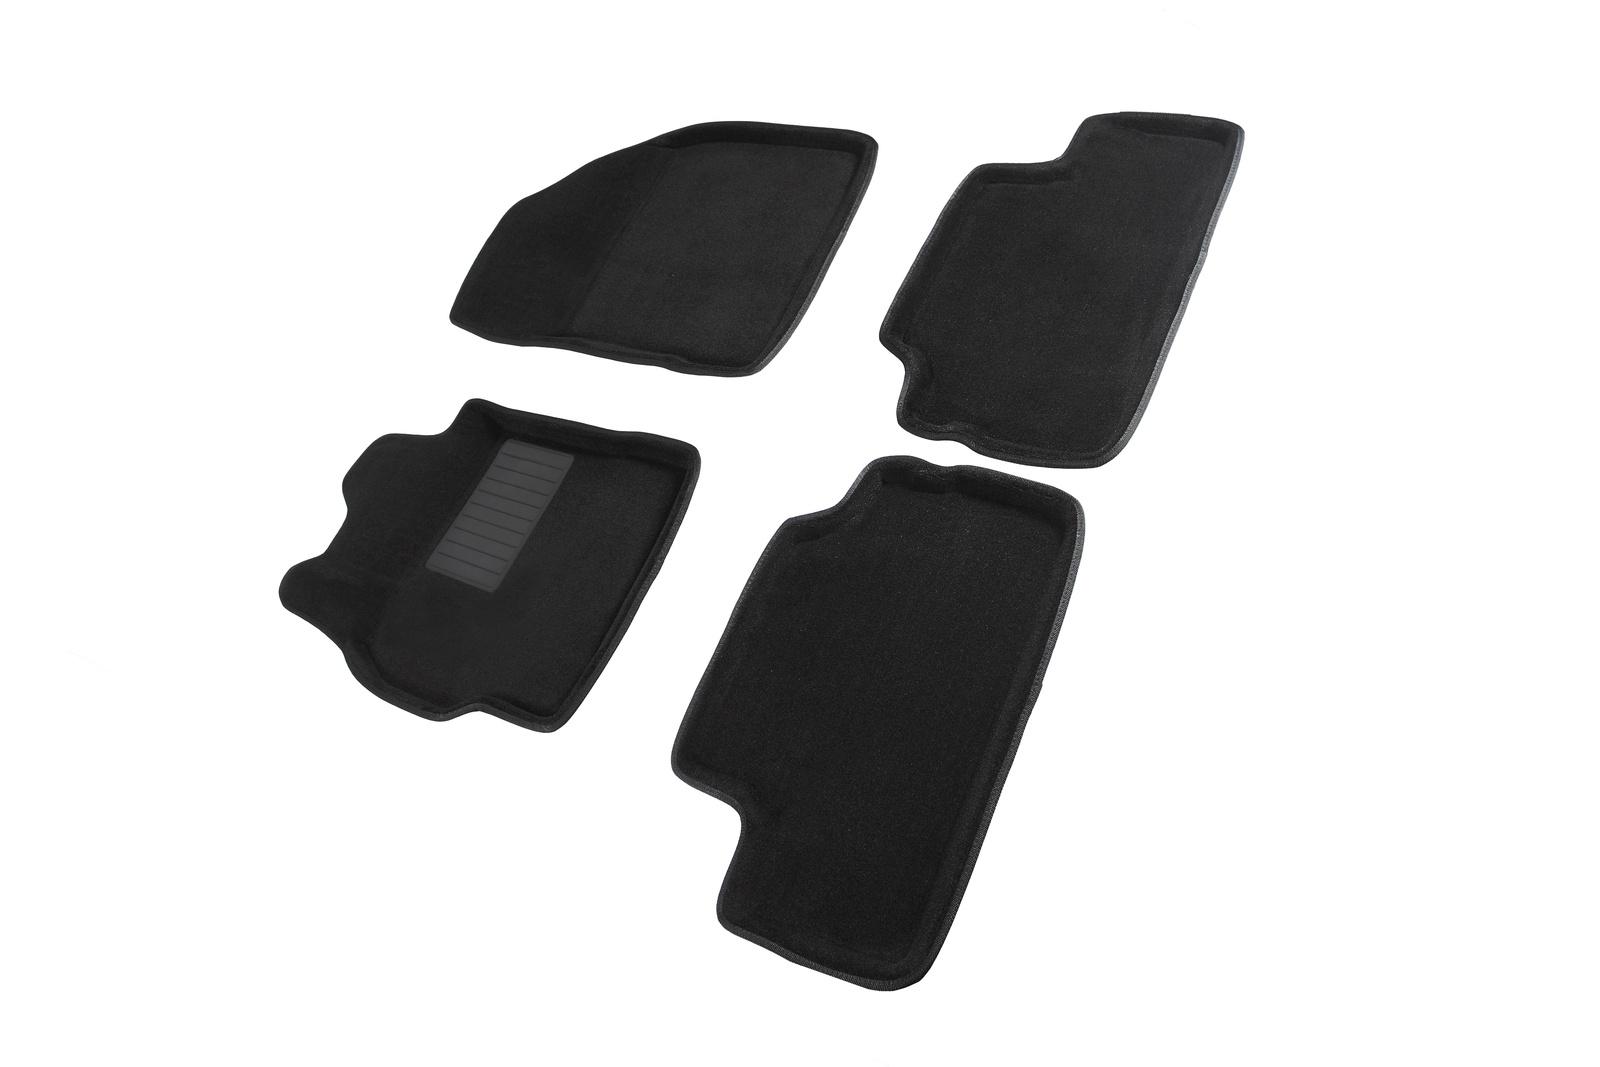 Коврики в салон автомобиля Seintex 3D коврики для Toyota Corolla X (300N/MC) 2007-2013 коврики салона rival для toyota rav4 2013 2015 2015 н в резина 65706001